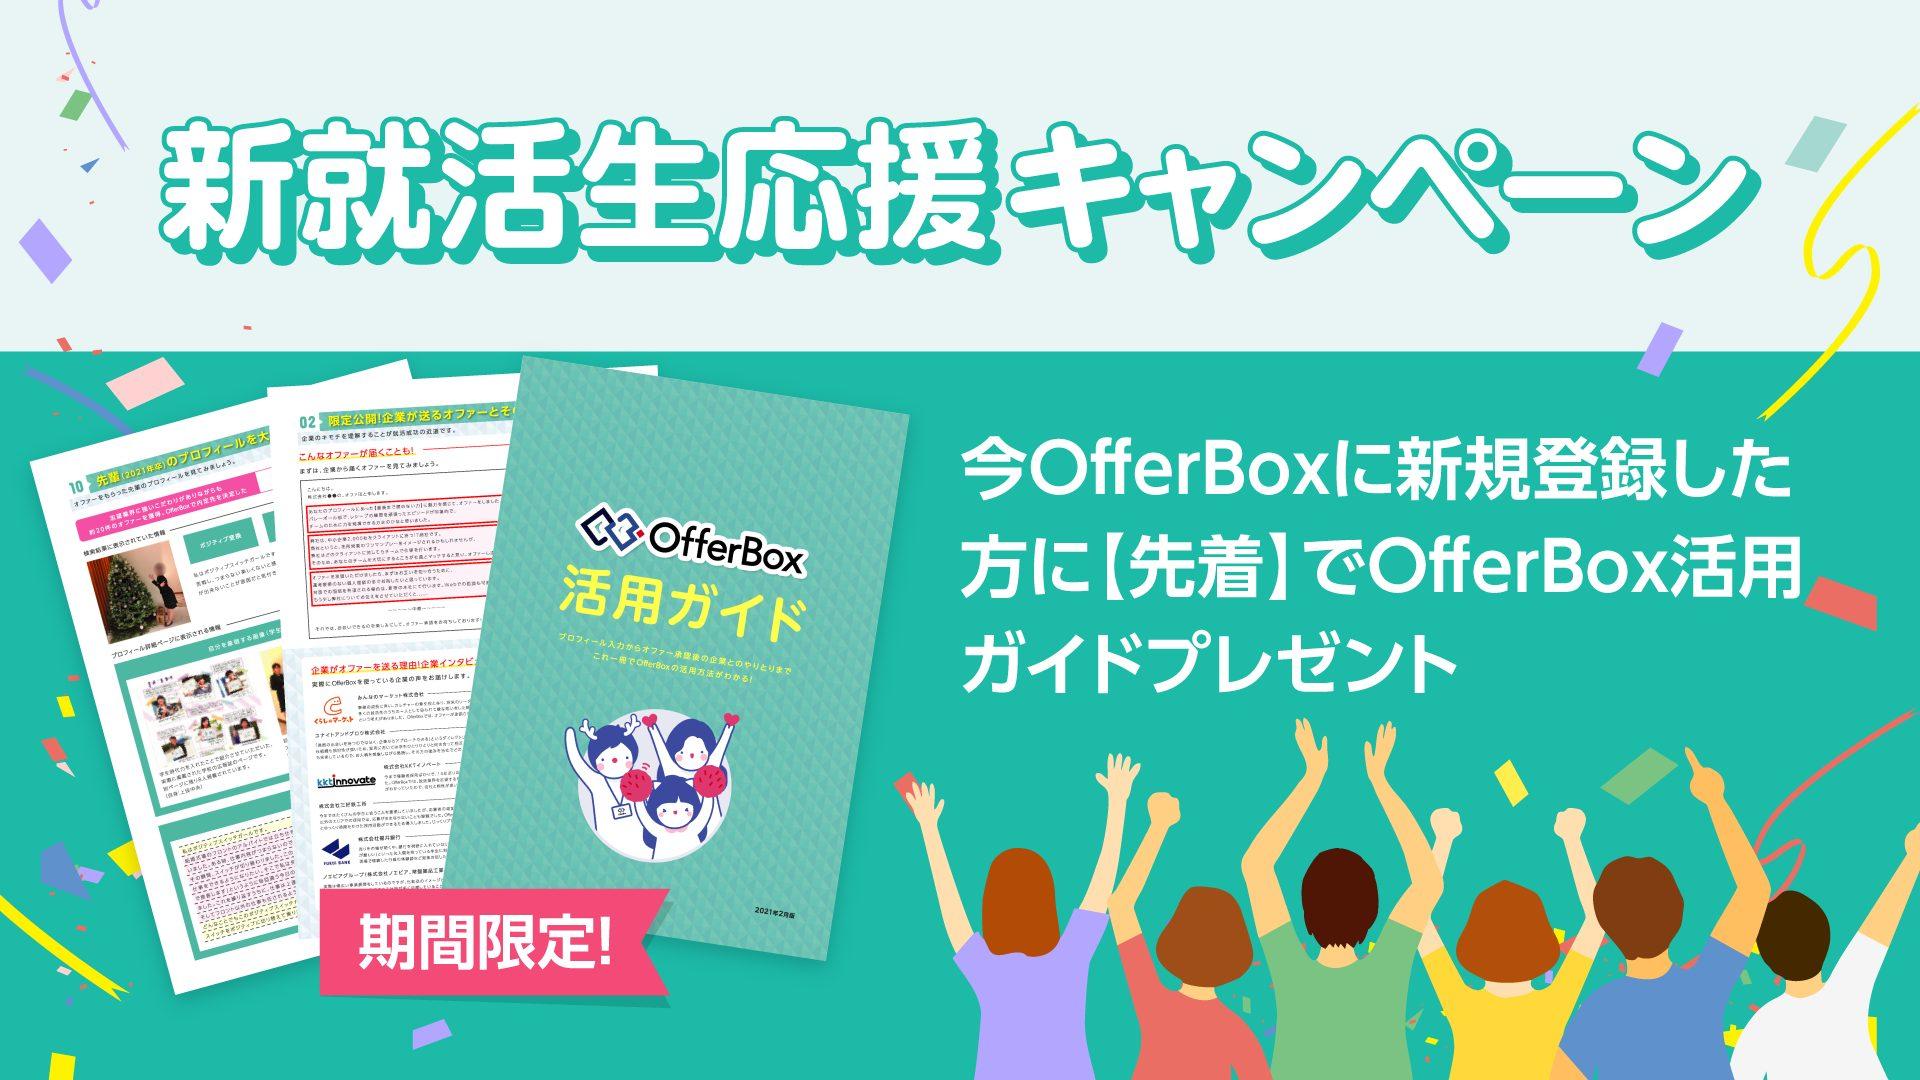 OfferBox活用ガイドがもらえる!新就活生応援キャンペーンFAQ